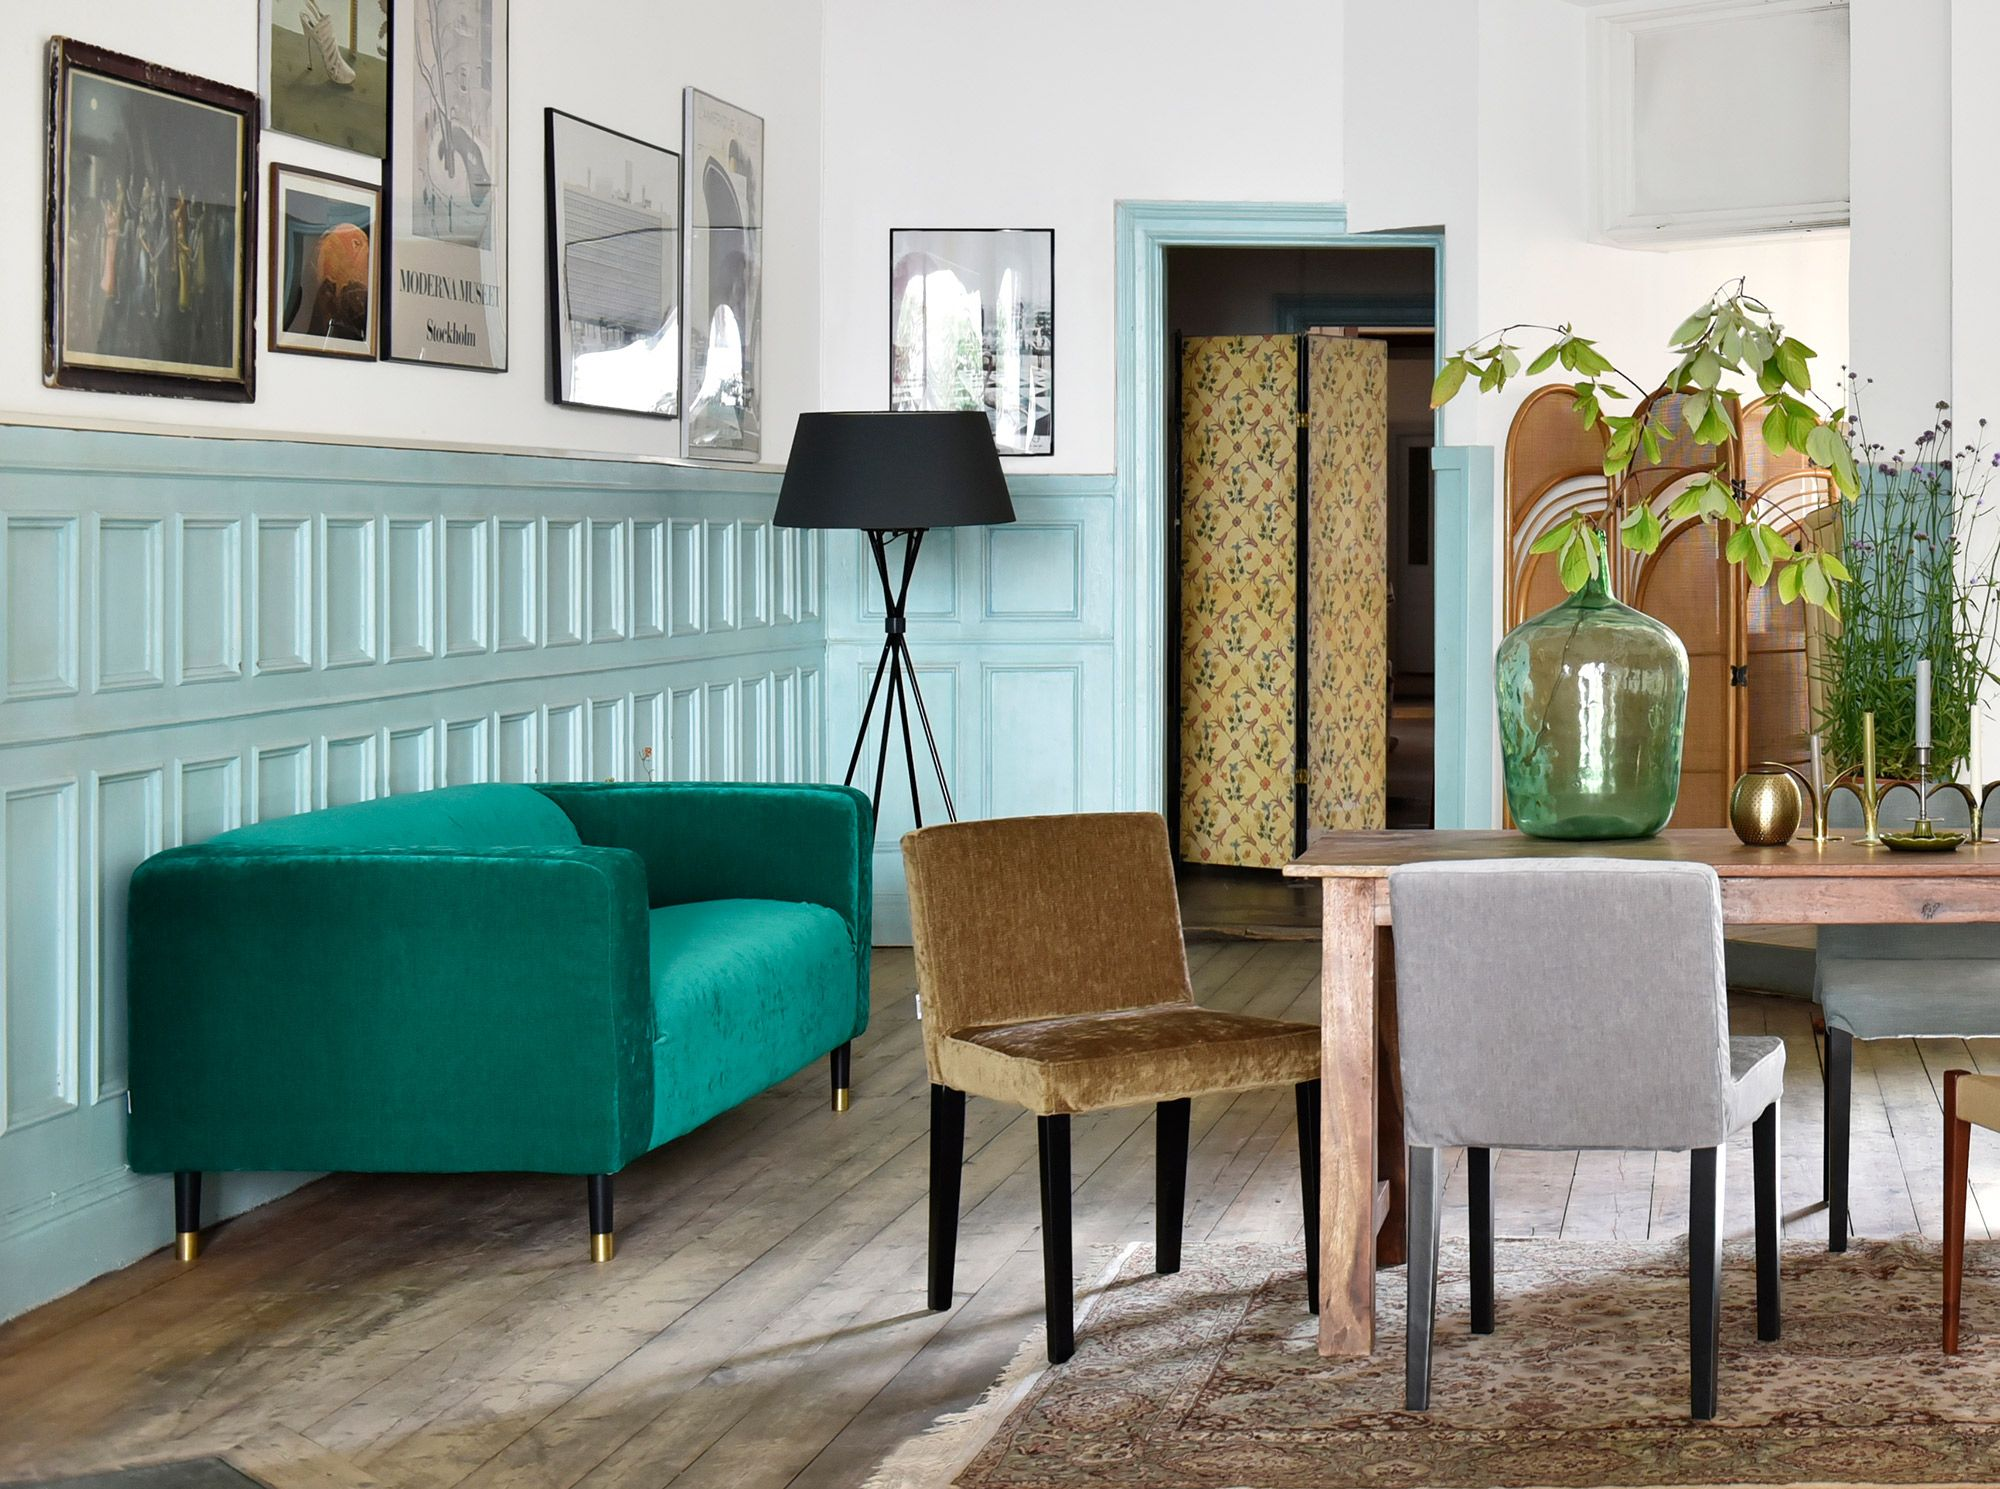 emerald green sofa covers wayfair furniture sectional klippan 2 seater cover bemzprettypegs pinterest